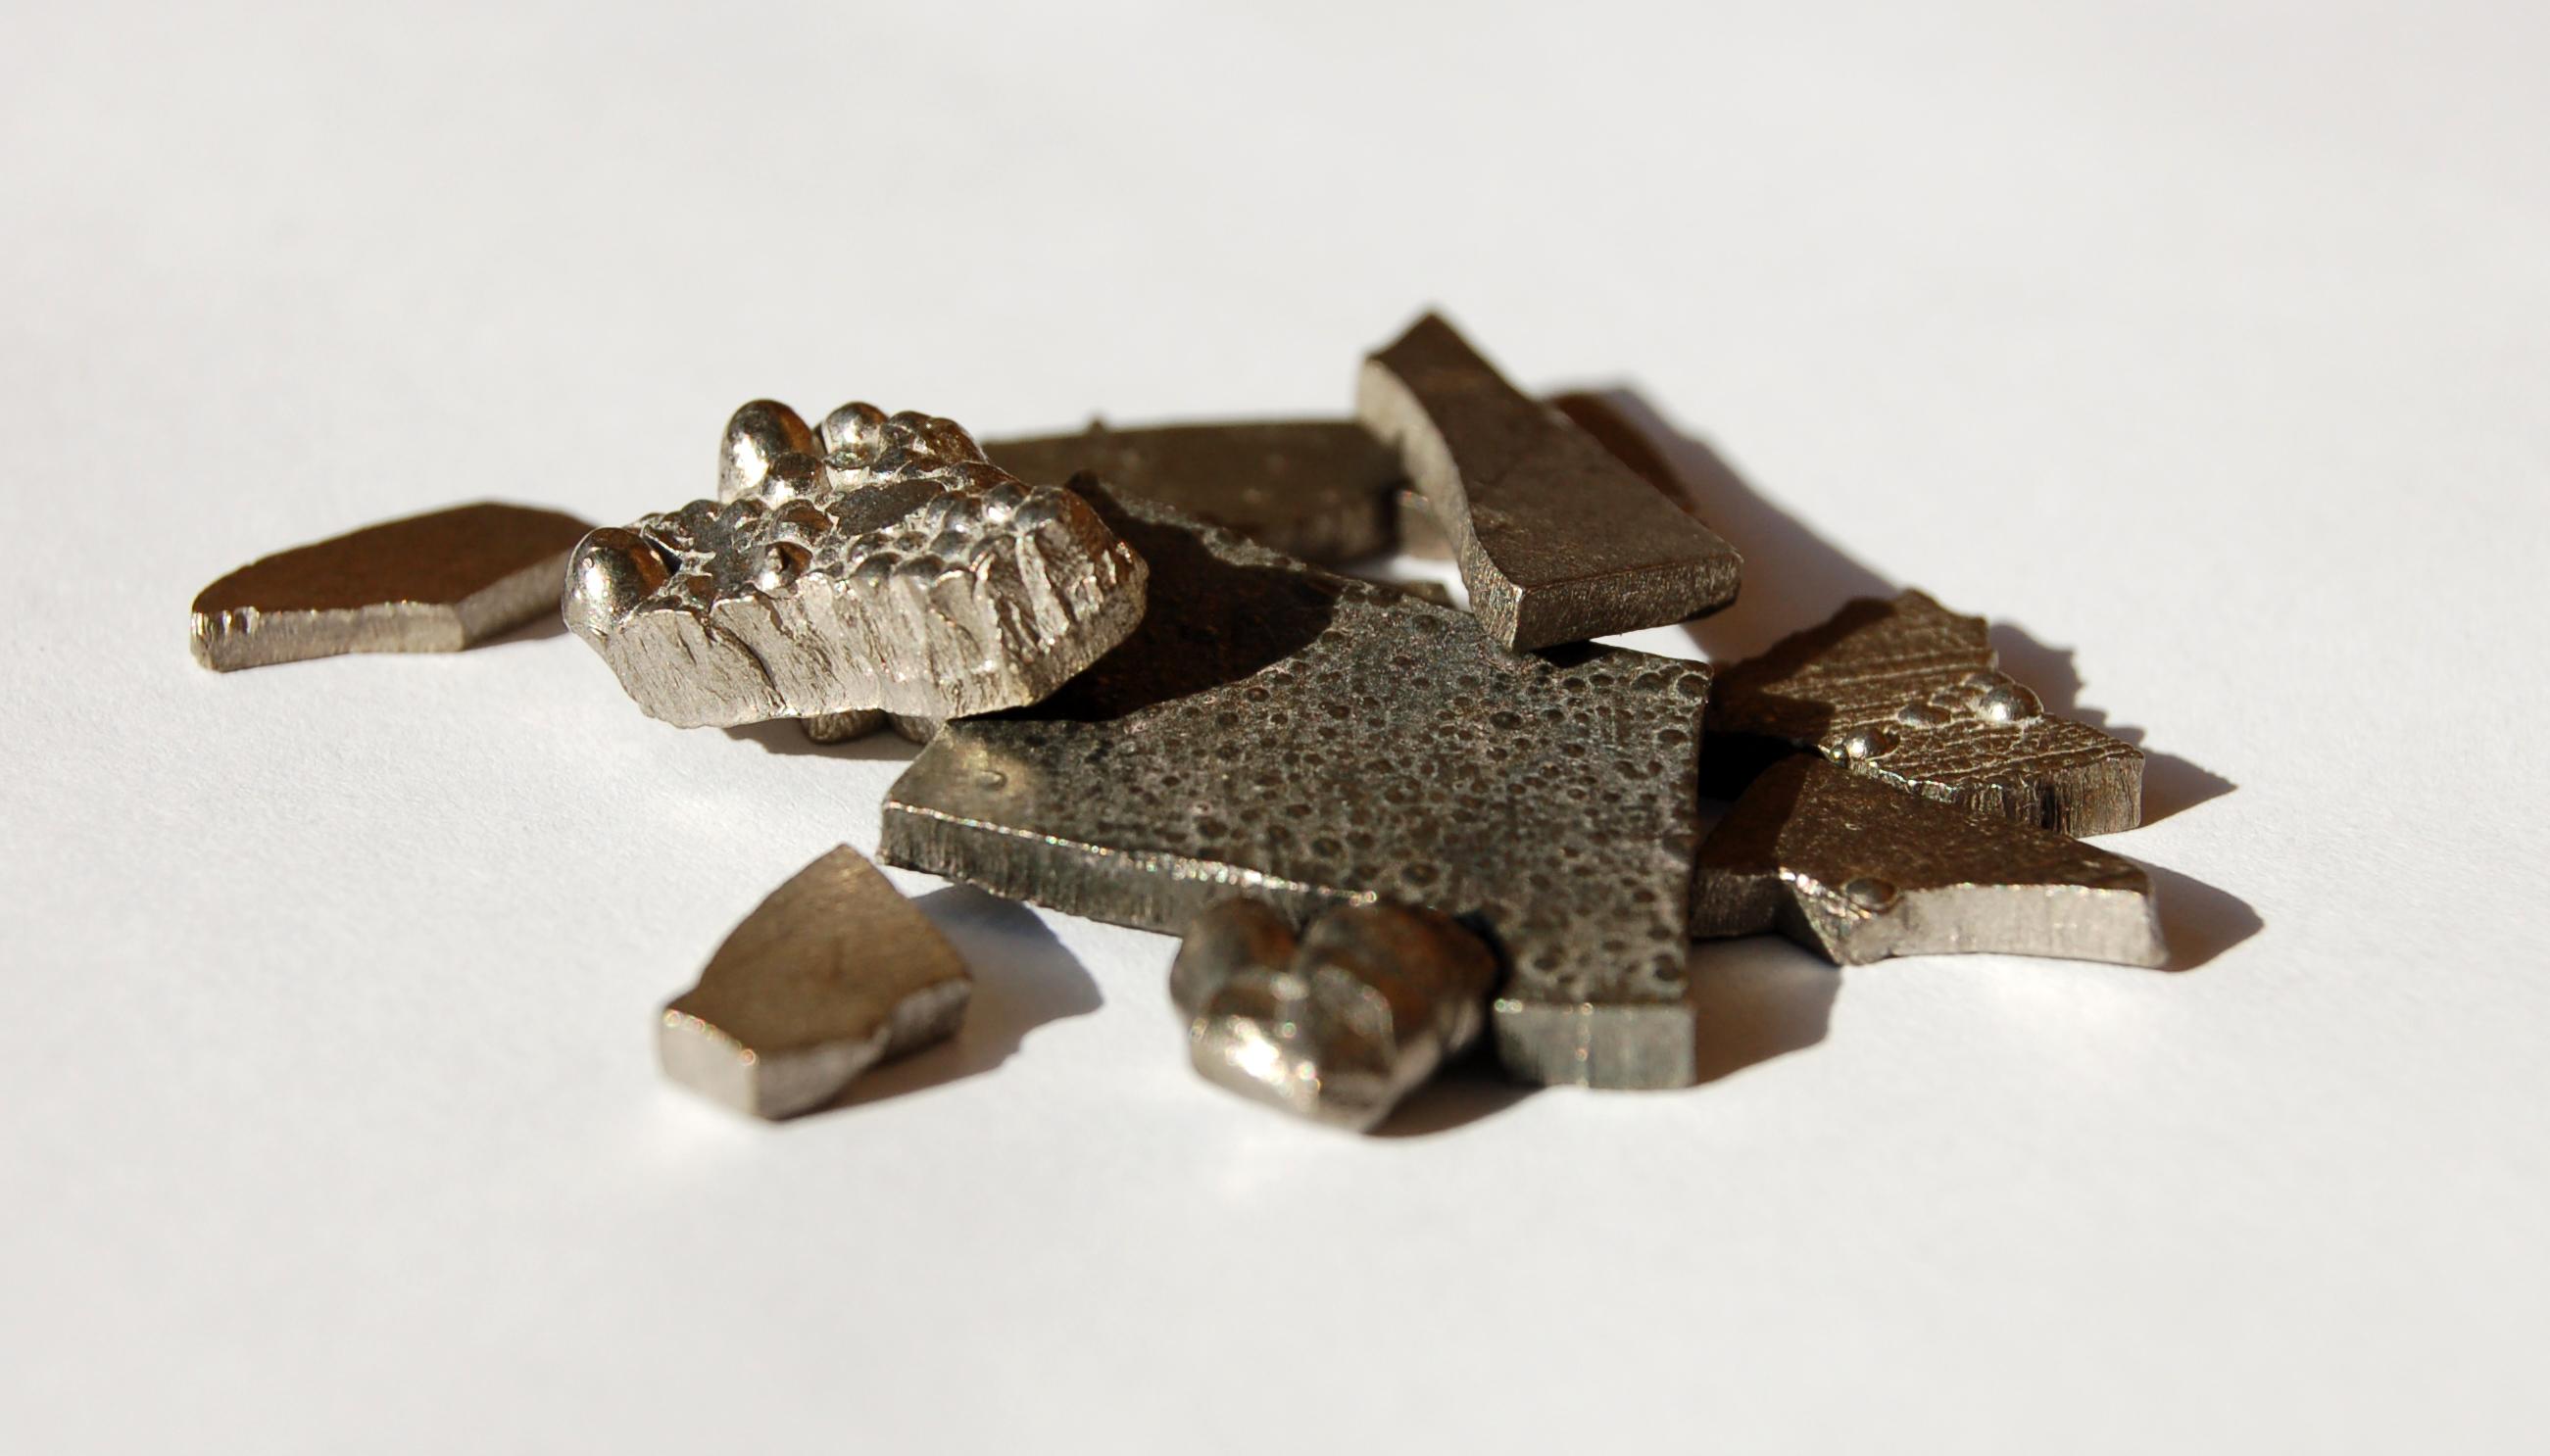 Depiction of Cobalto